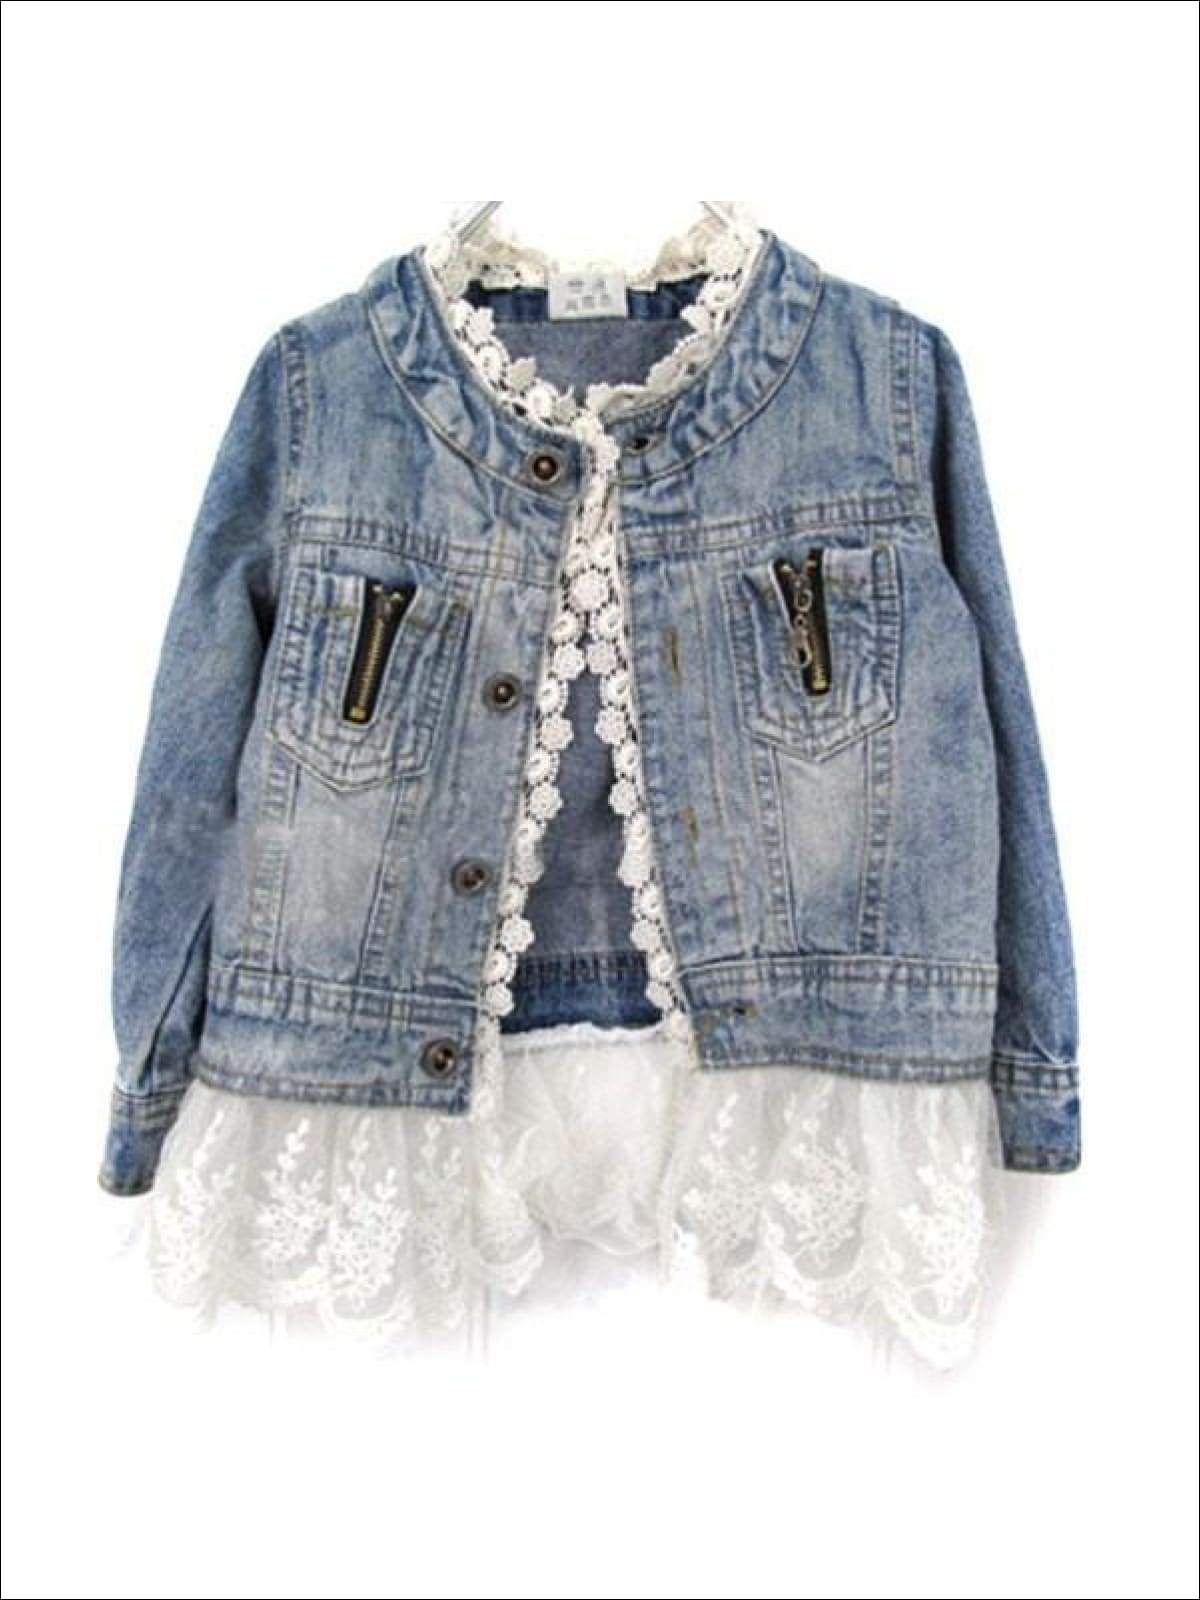 Girls Denim Jacket With Lace Trim Long Sleeve Denim Jacket Jean Jacket For Girls Girls Denim Jacket [ 1600 x 1200 Pixel ]